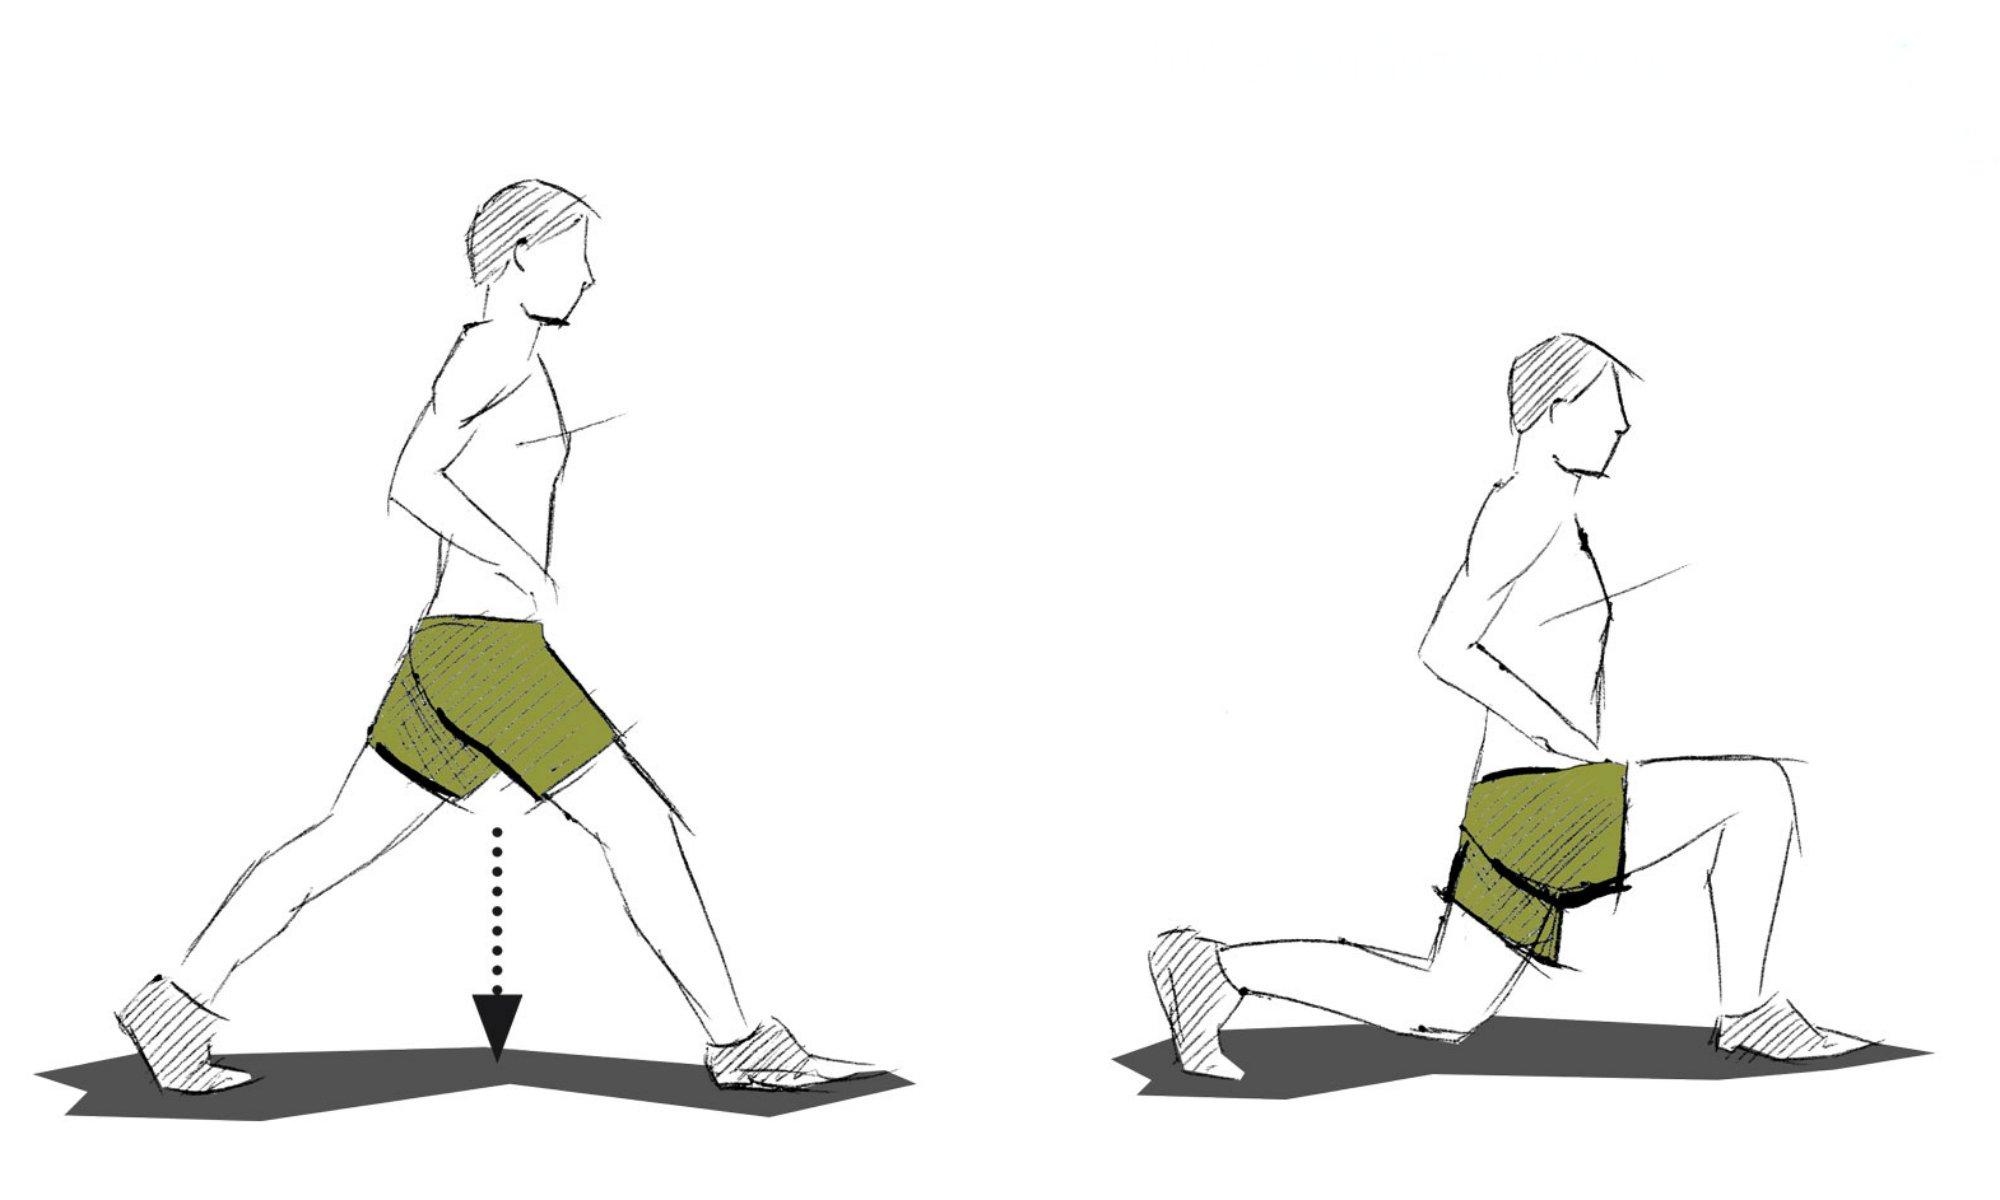 Explication de l'exercice des fentes.